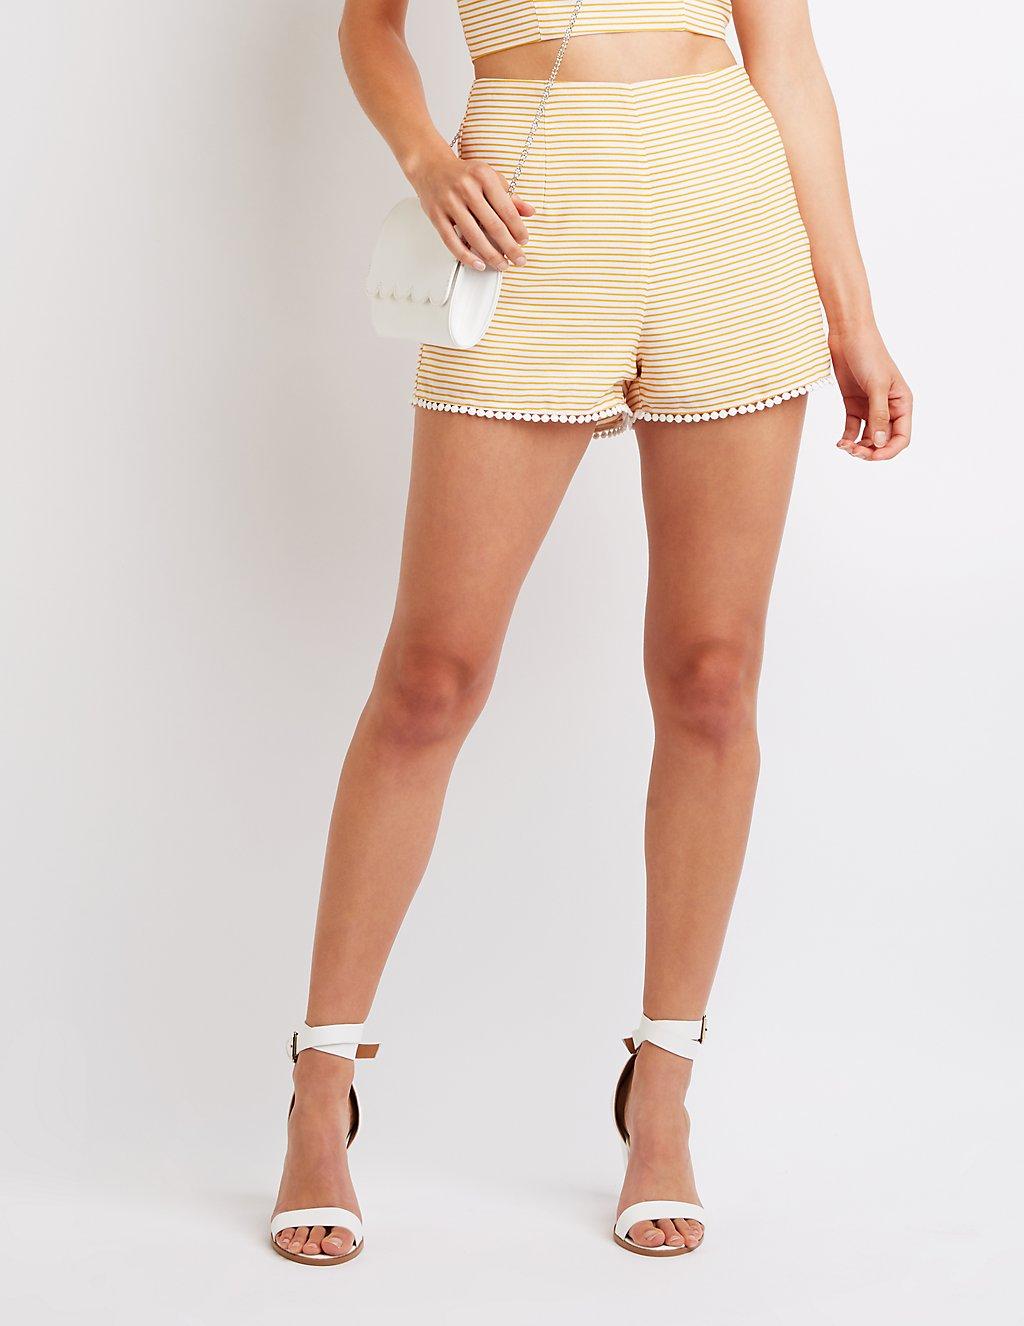 Striped Hi Waist Shorts - $19.99